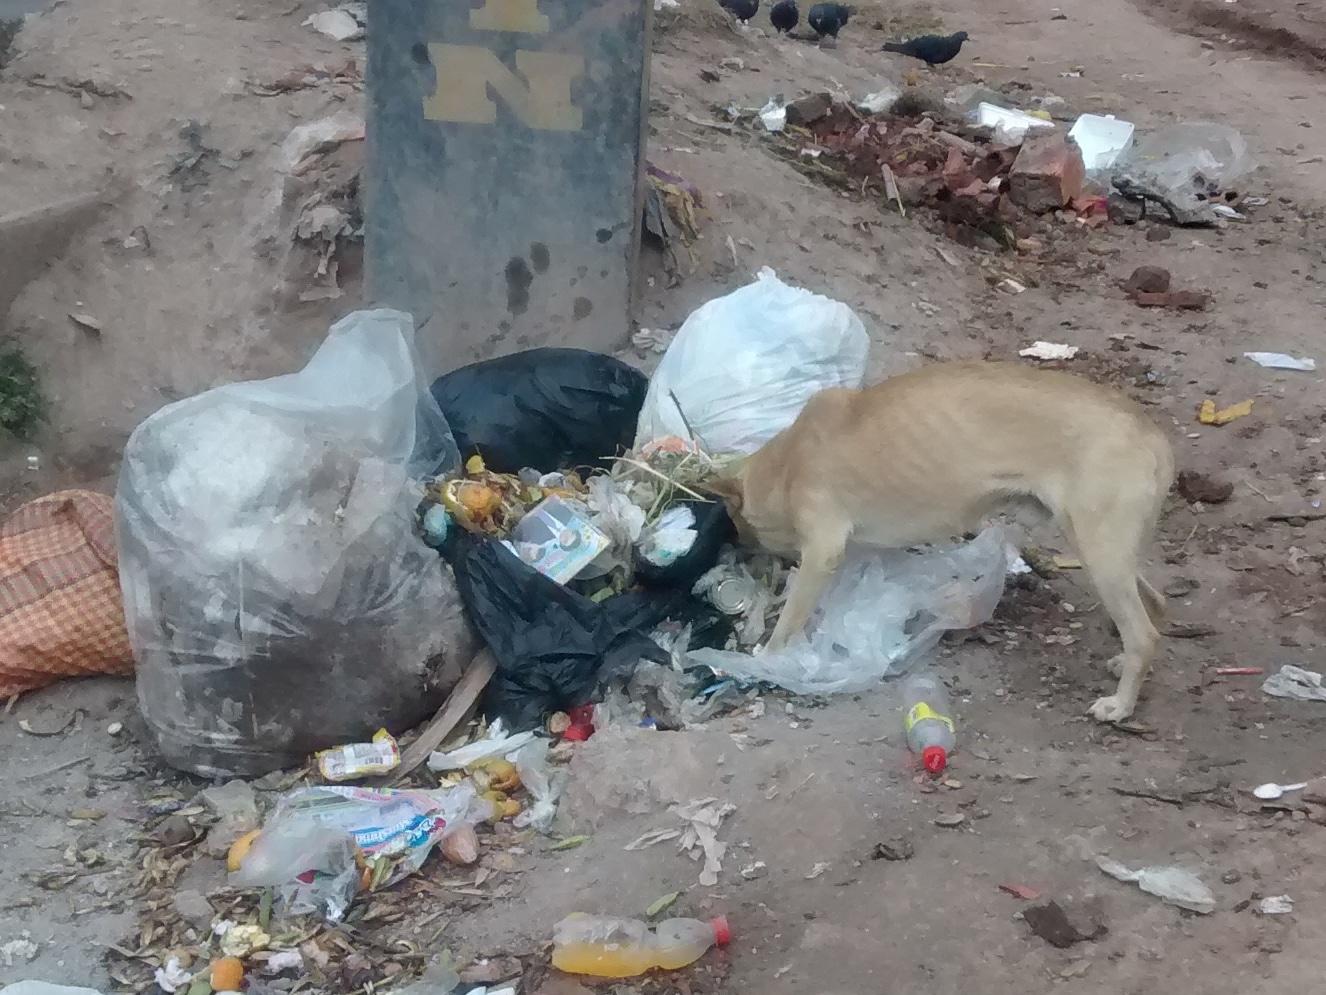 Peru street dog